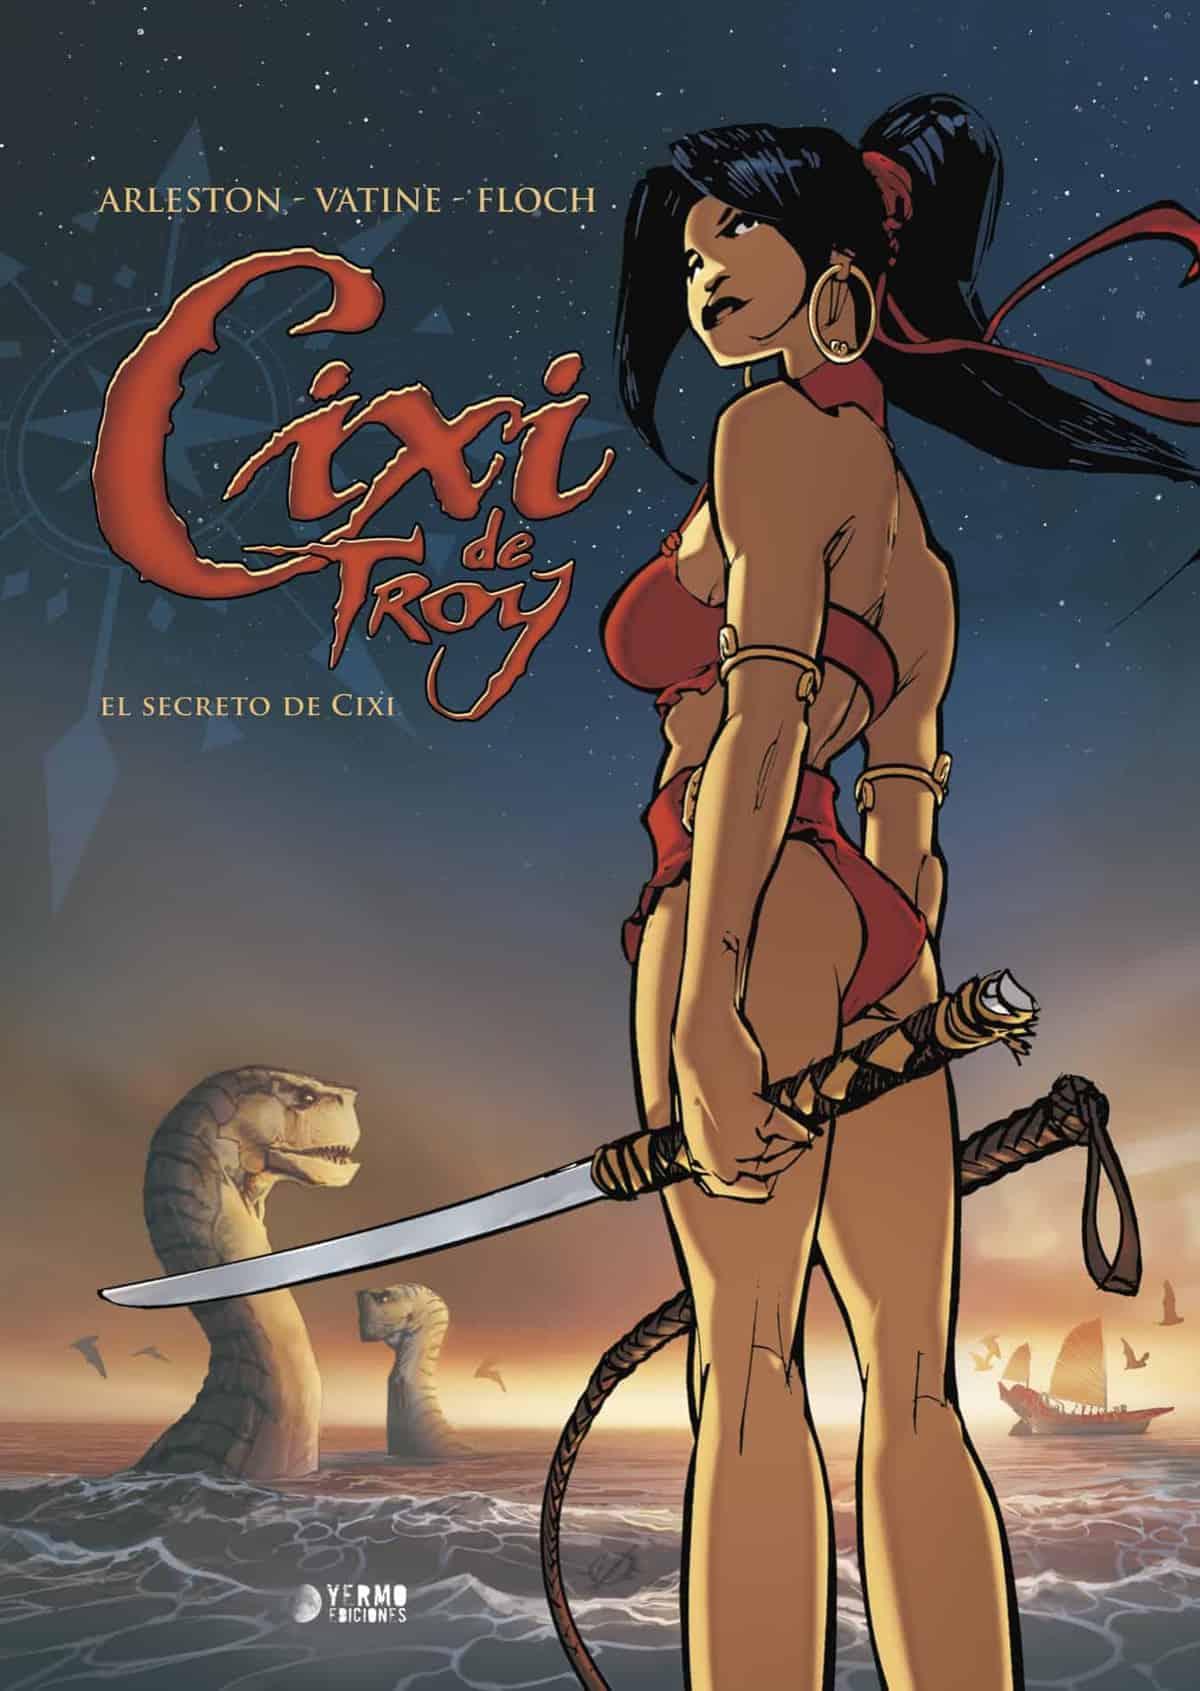 CIXI DE TROY (EDICION INTEGRAL)